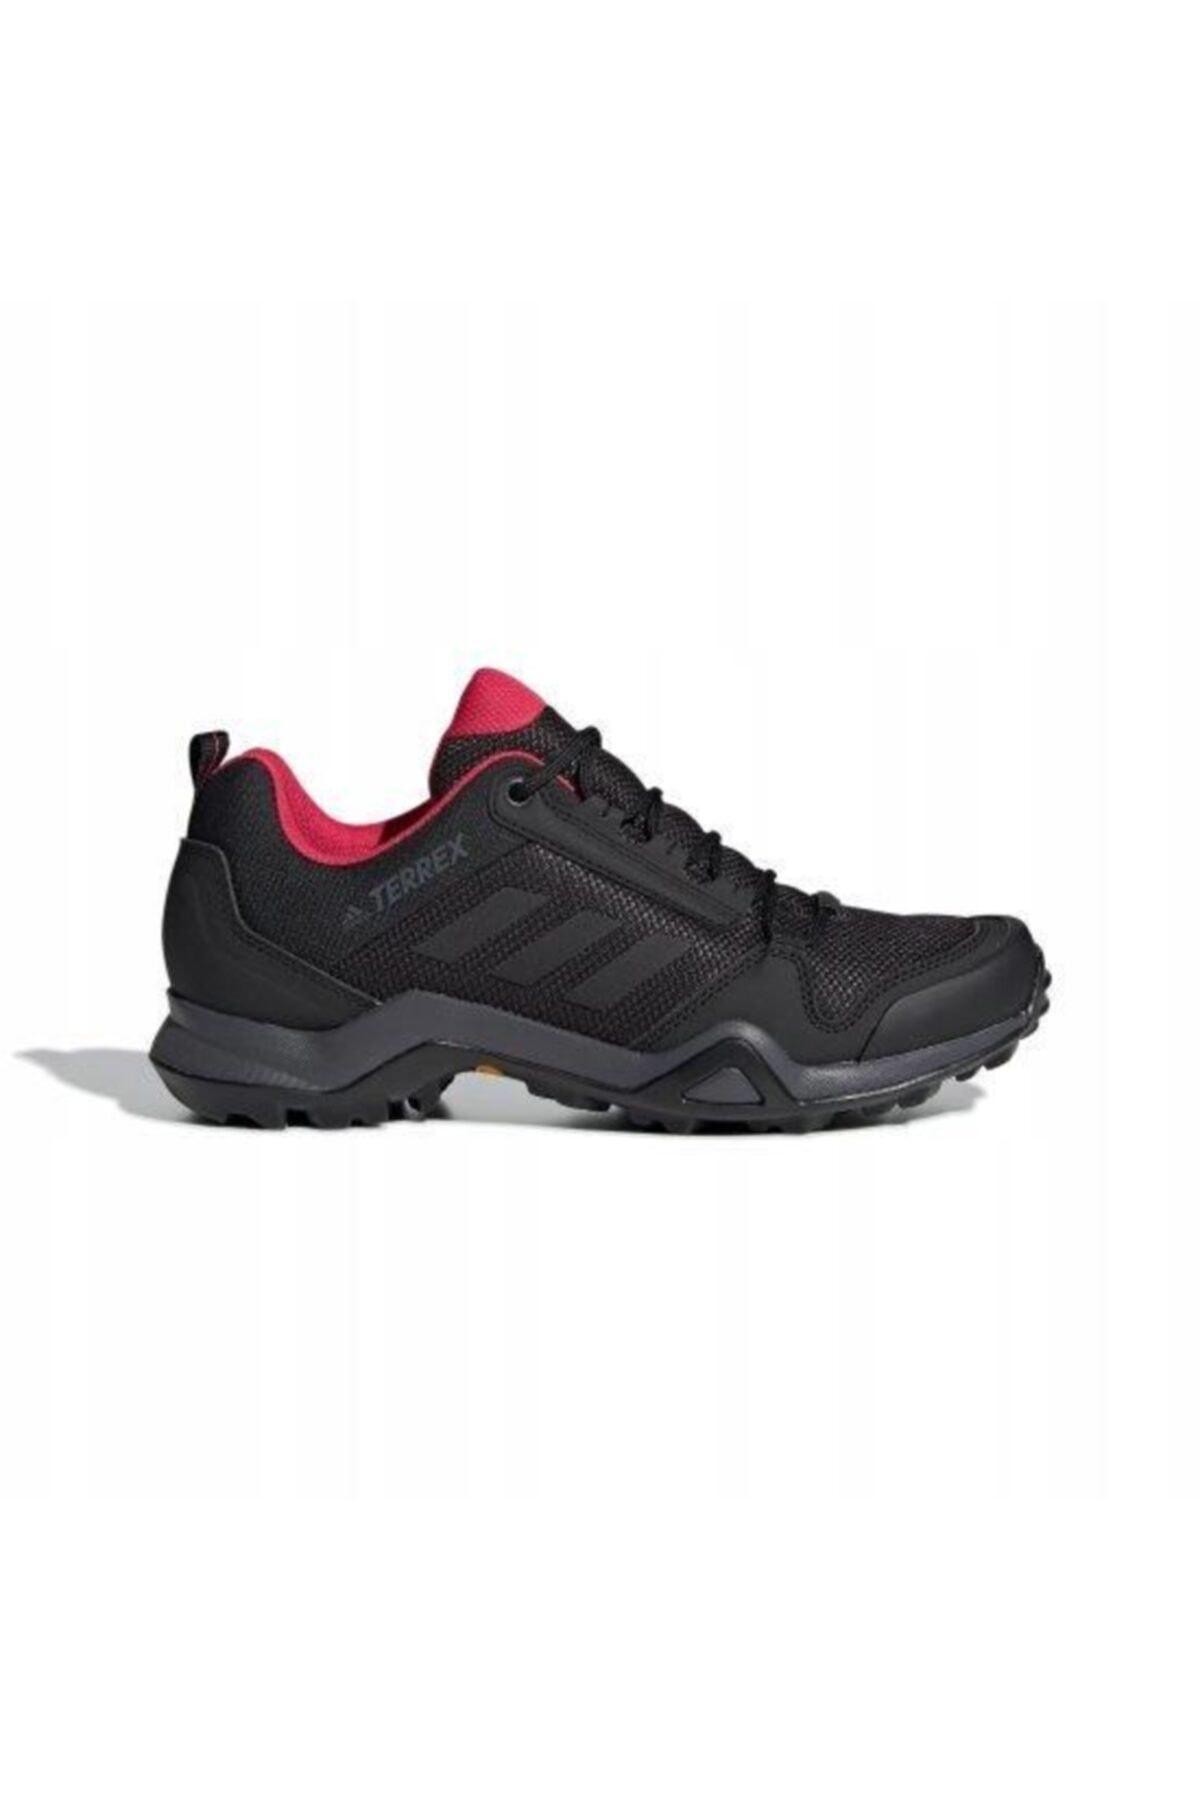 adidas Terrex Ax3 W Bb9519 Kadın Outdoor Ayakkabı 1